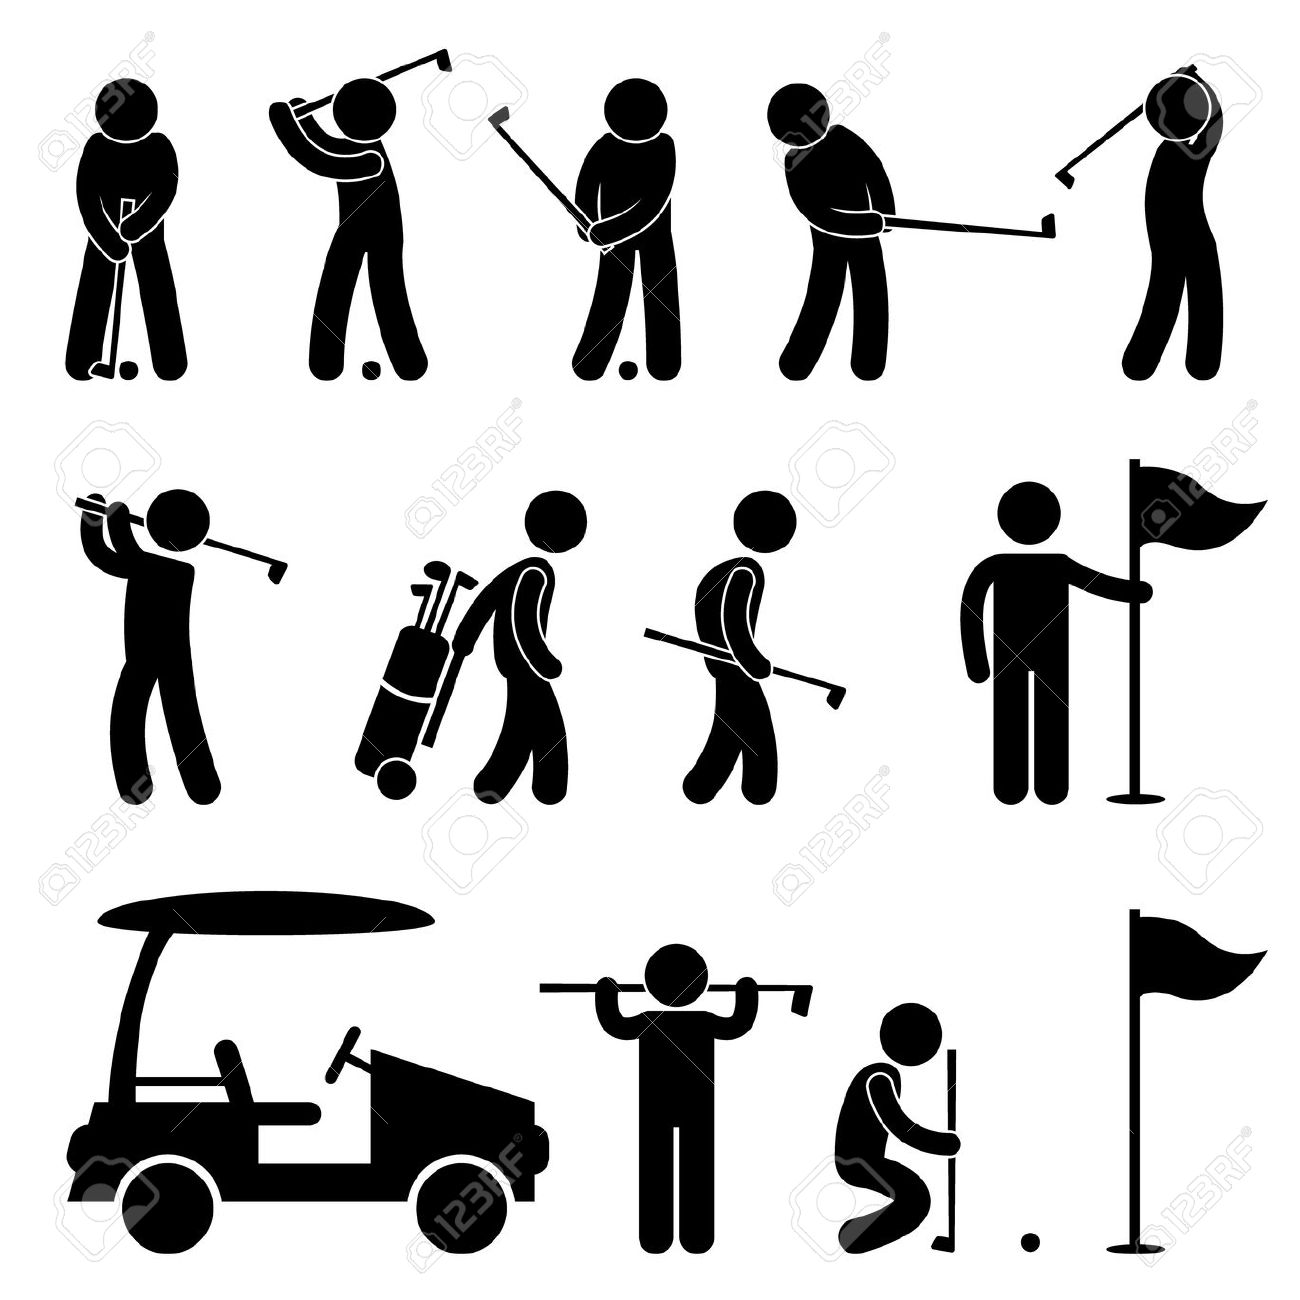 Golf Golfer Swing People Caddy Caddie Pictogram Royalty Free.